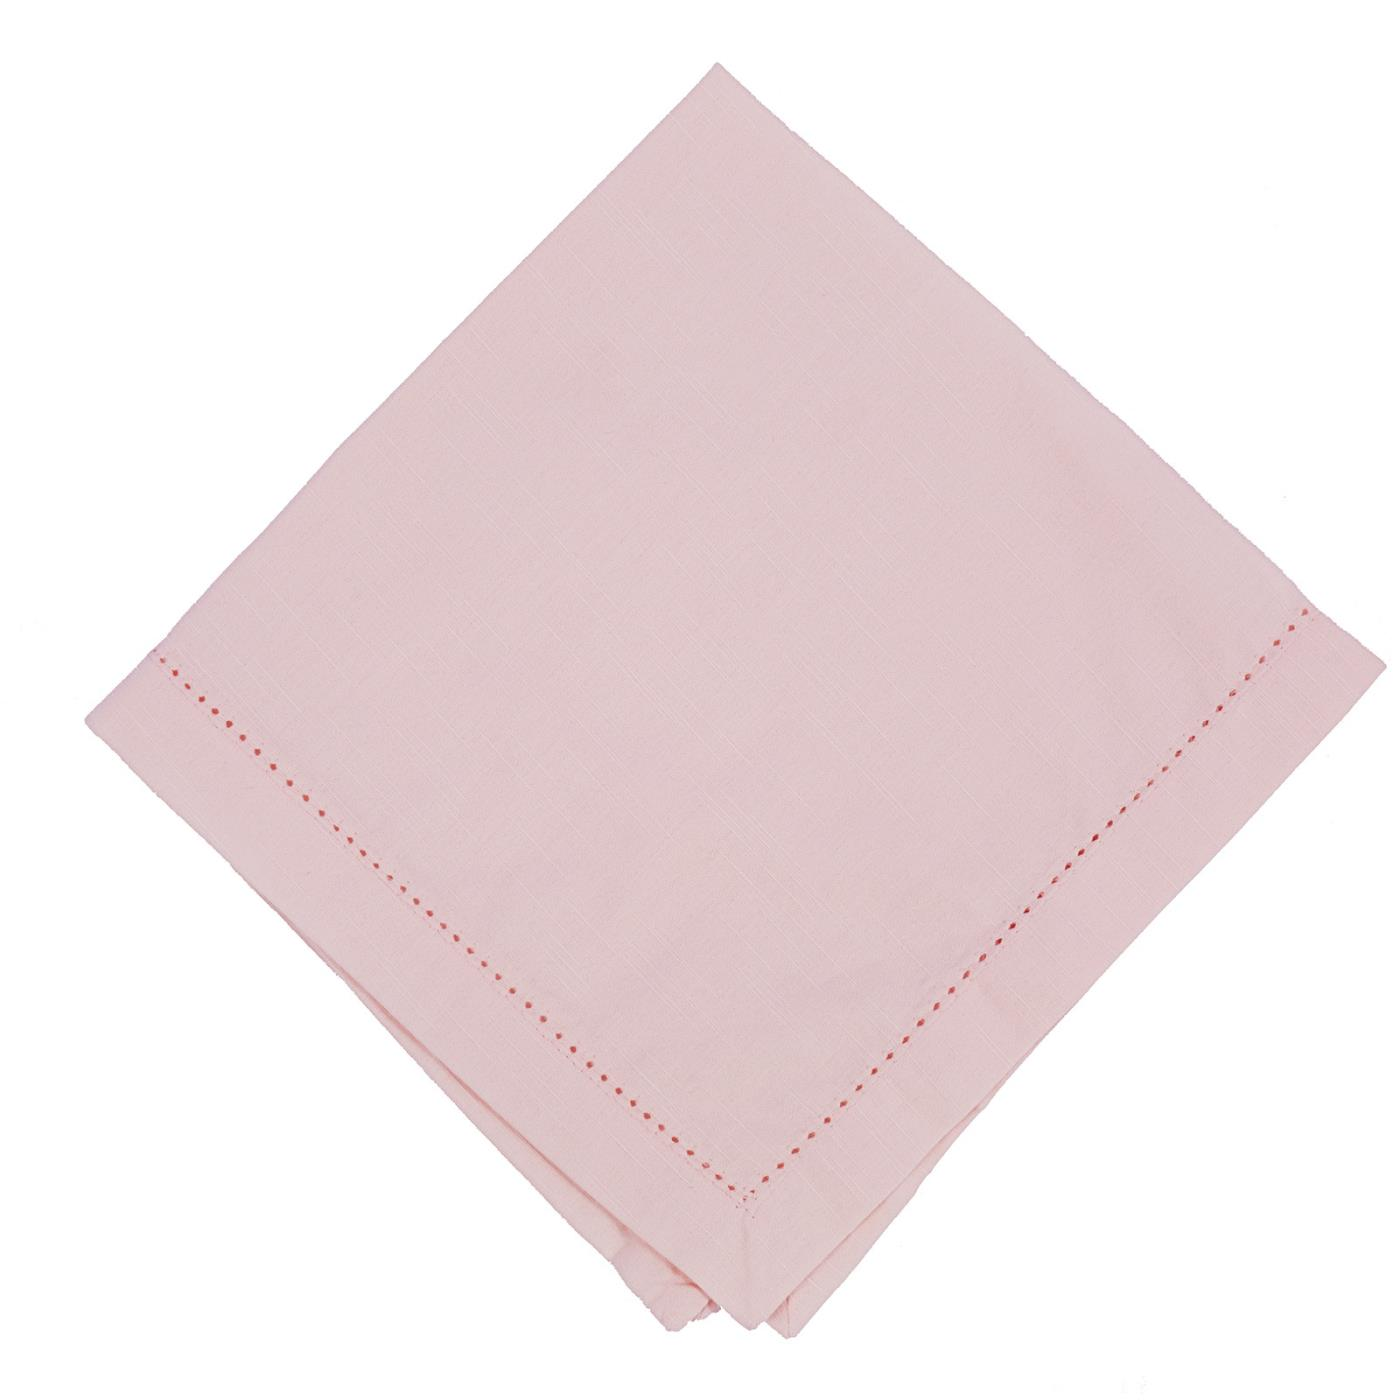 Pale Pink - Linen - Hemstitched